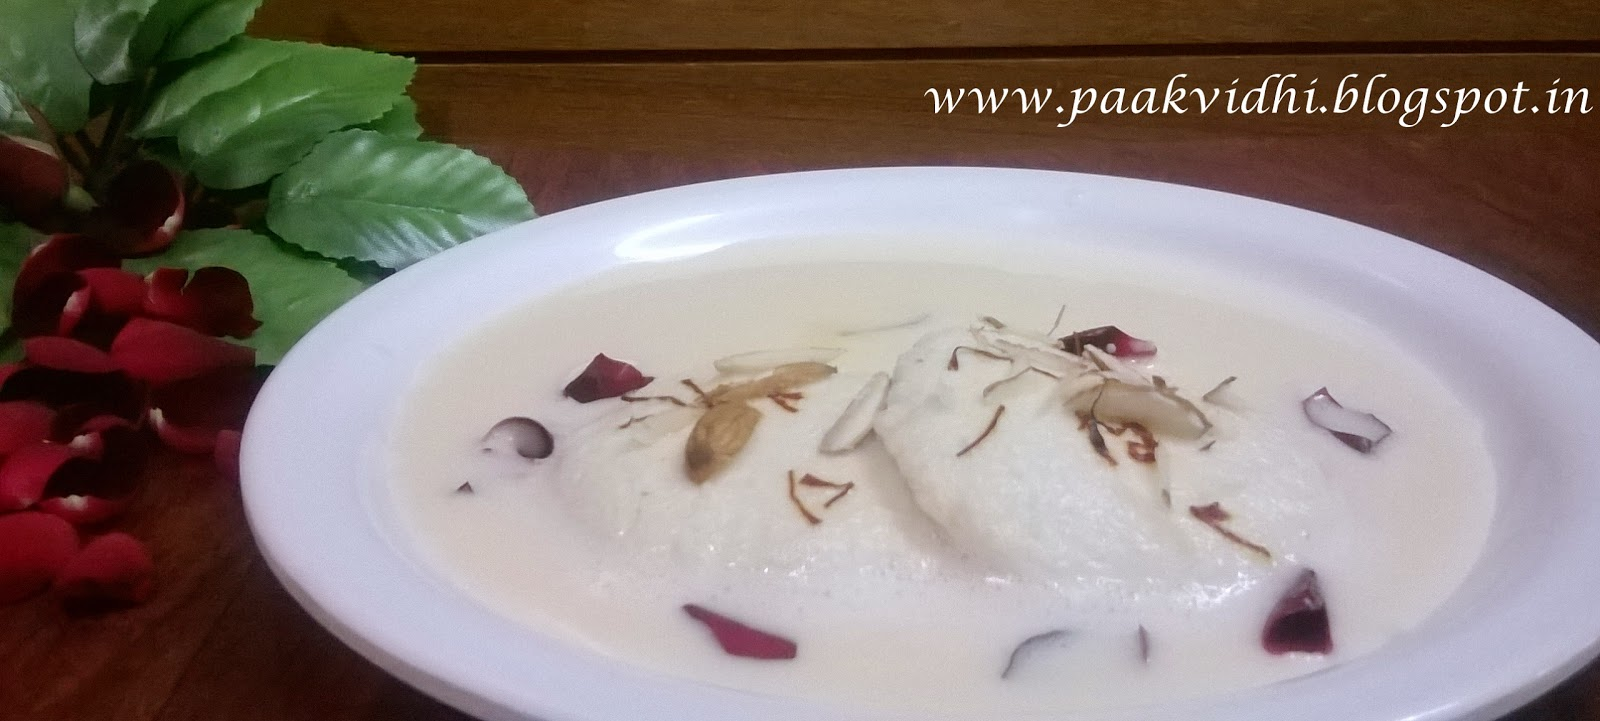 http://paakvidhi.blogspot.in/2014/03/rasmalai.html